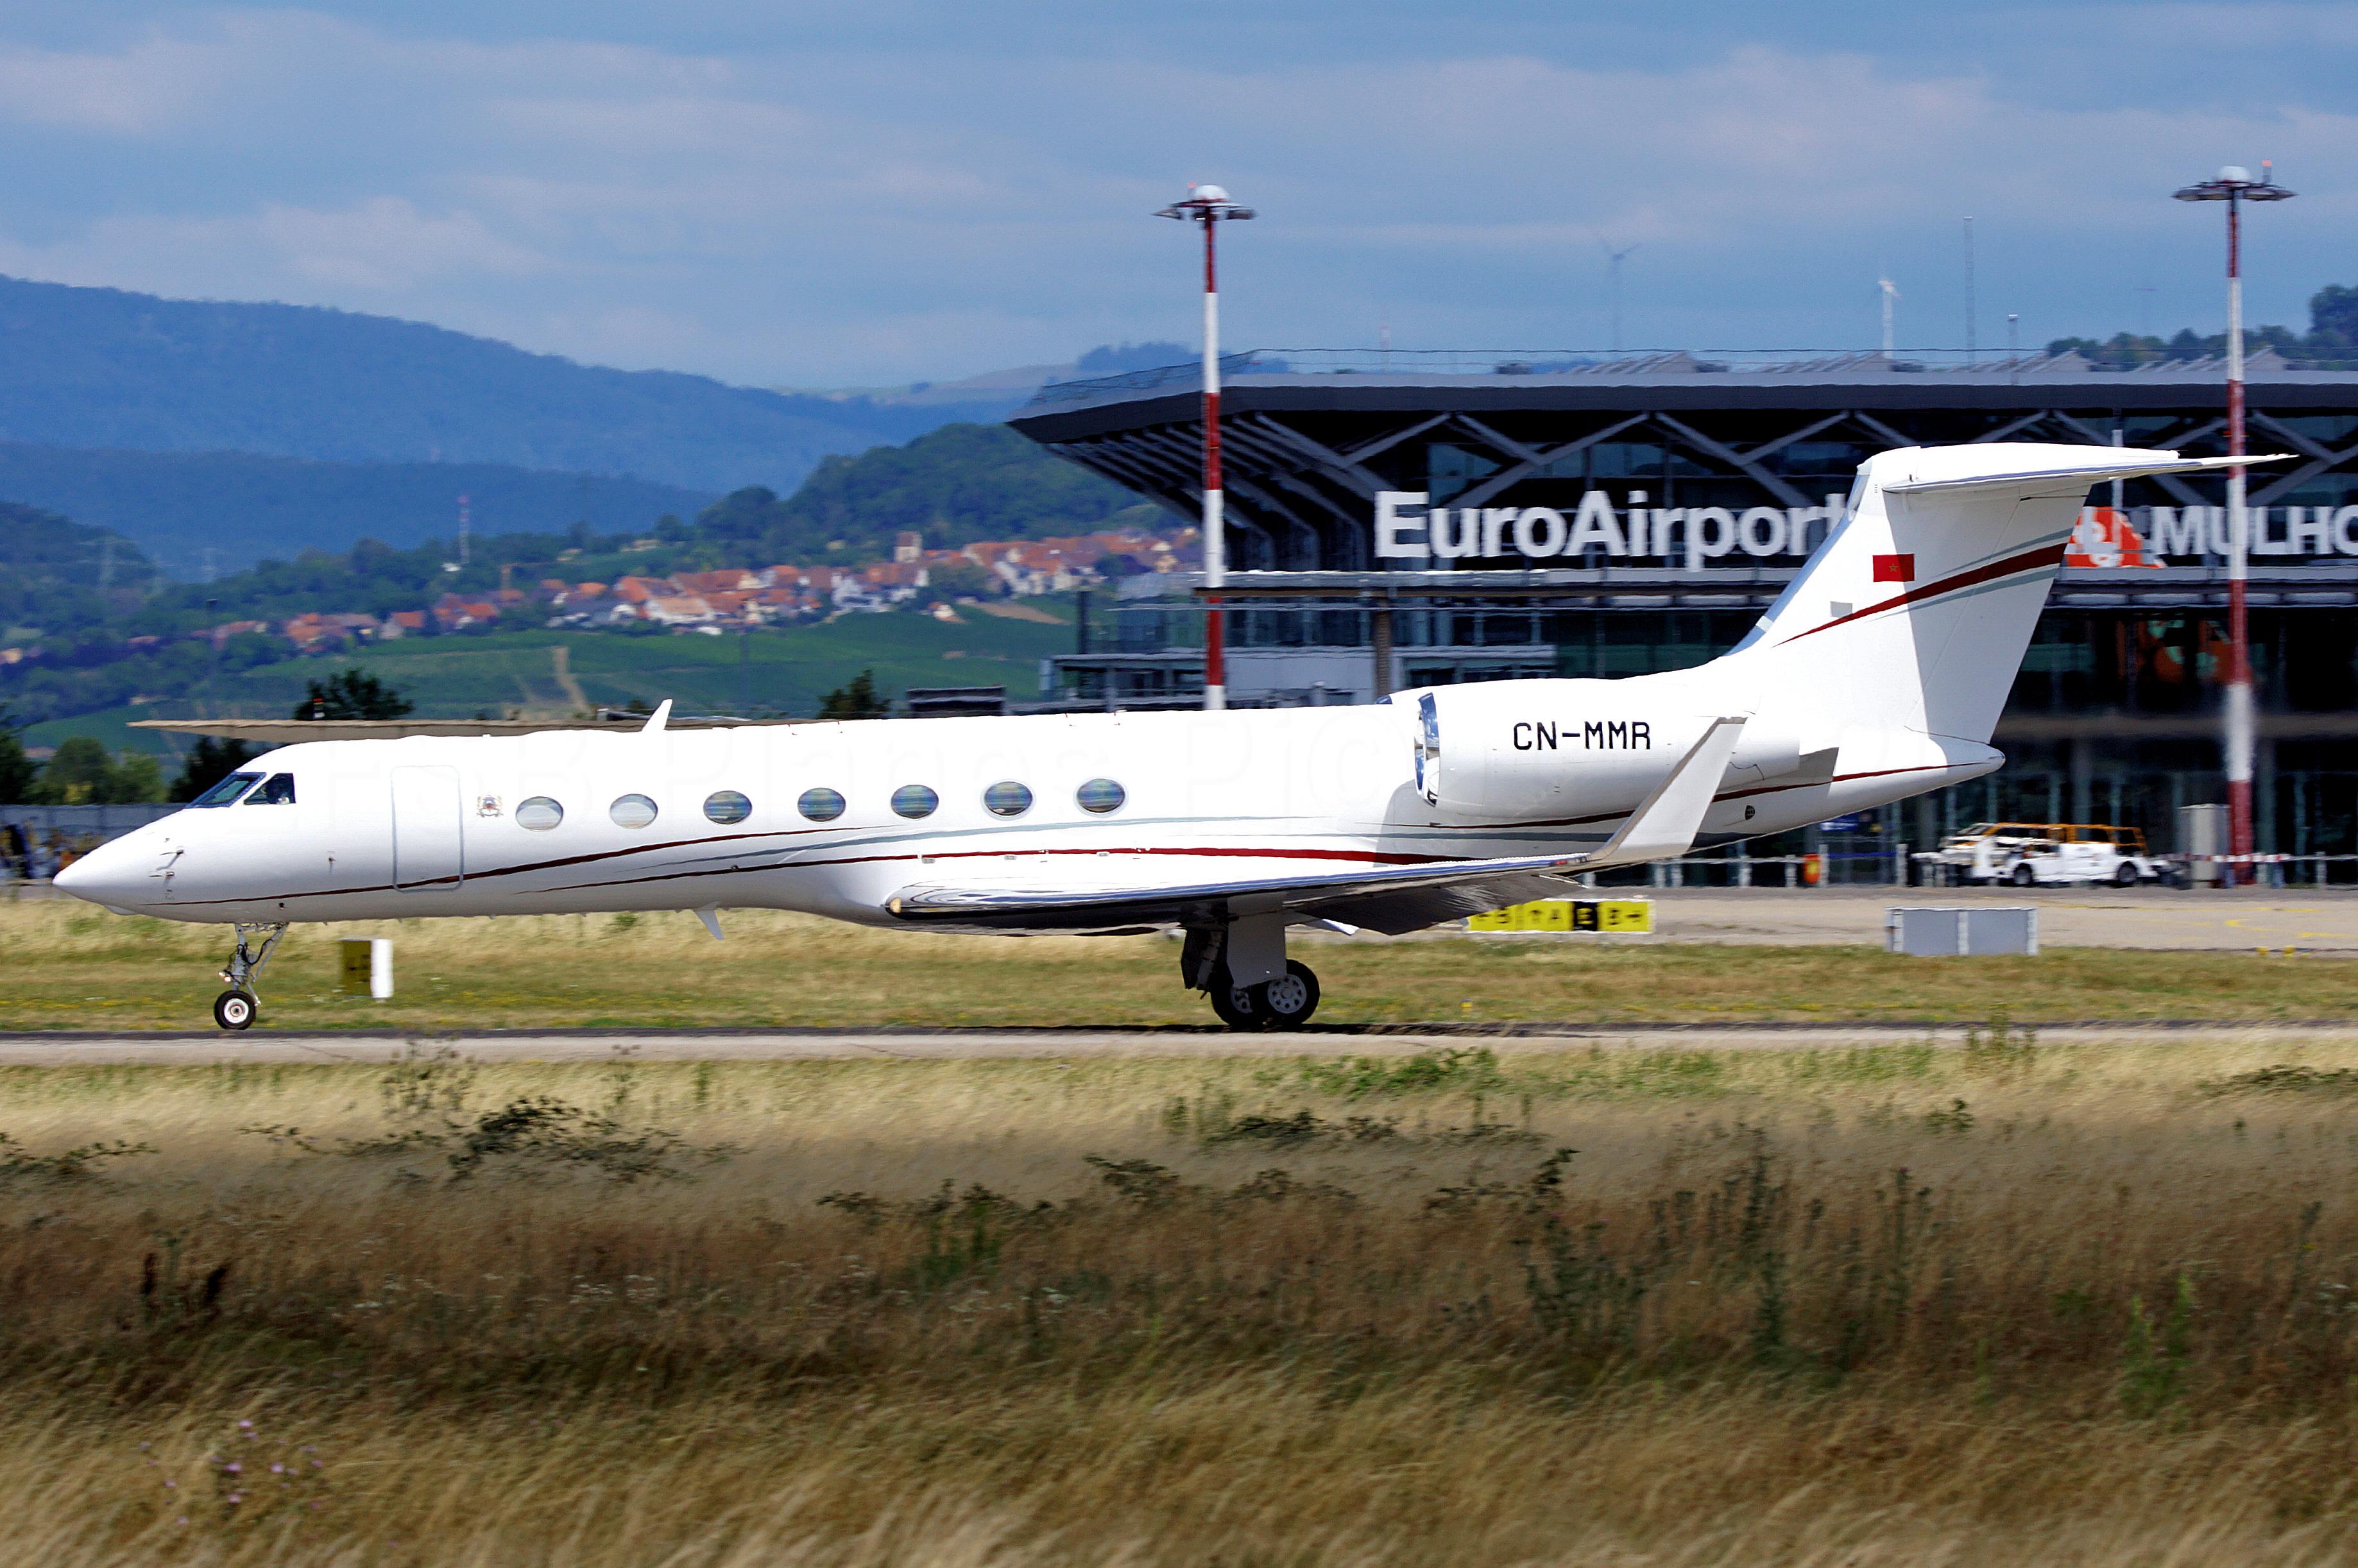 FRA: Avions VIP, Liaison & ECM - Page 24 50101618901_dd0713b561_o_d